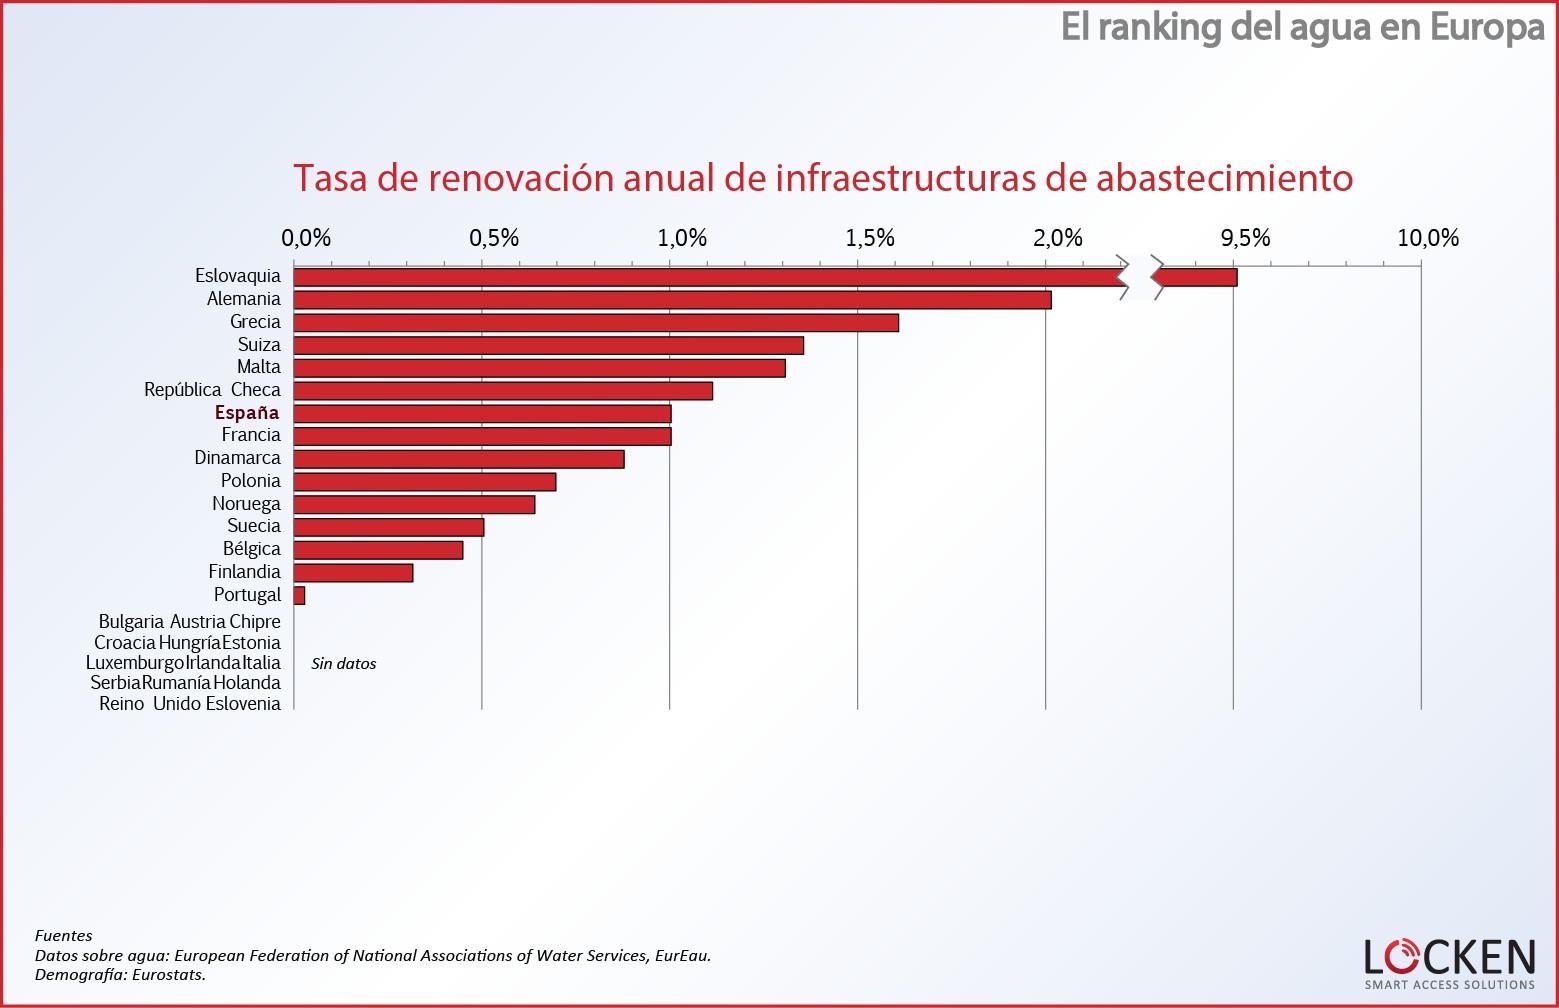 ranking-agua-europa-tasa-renovacion-anual